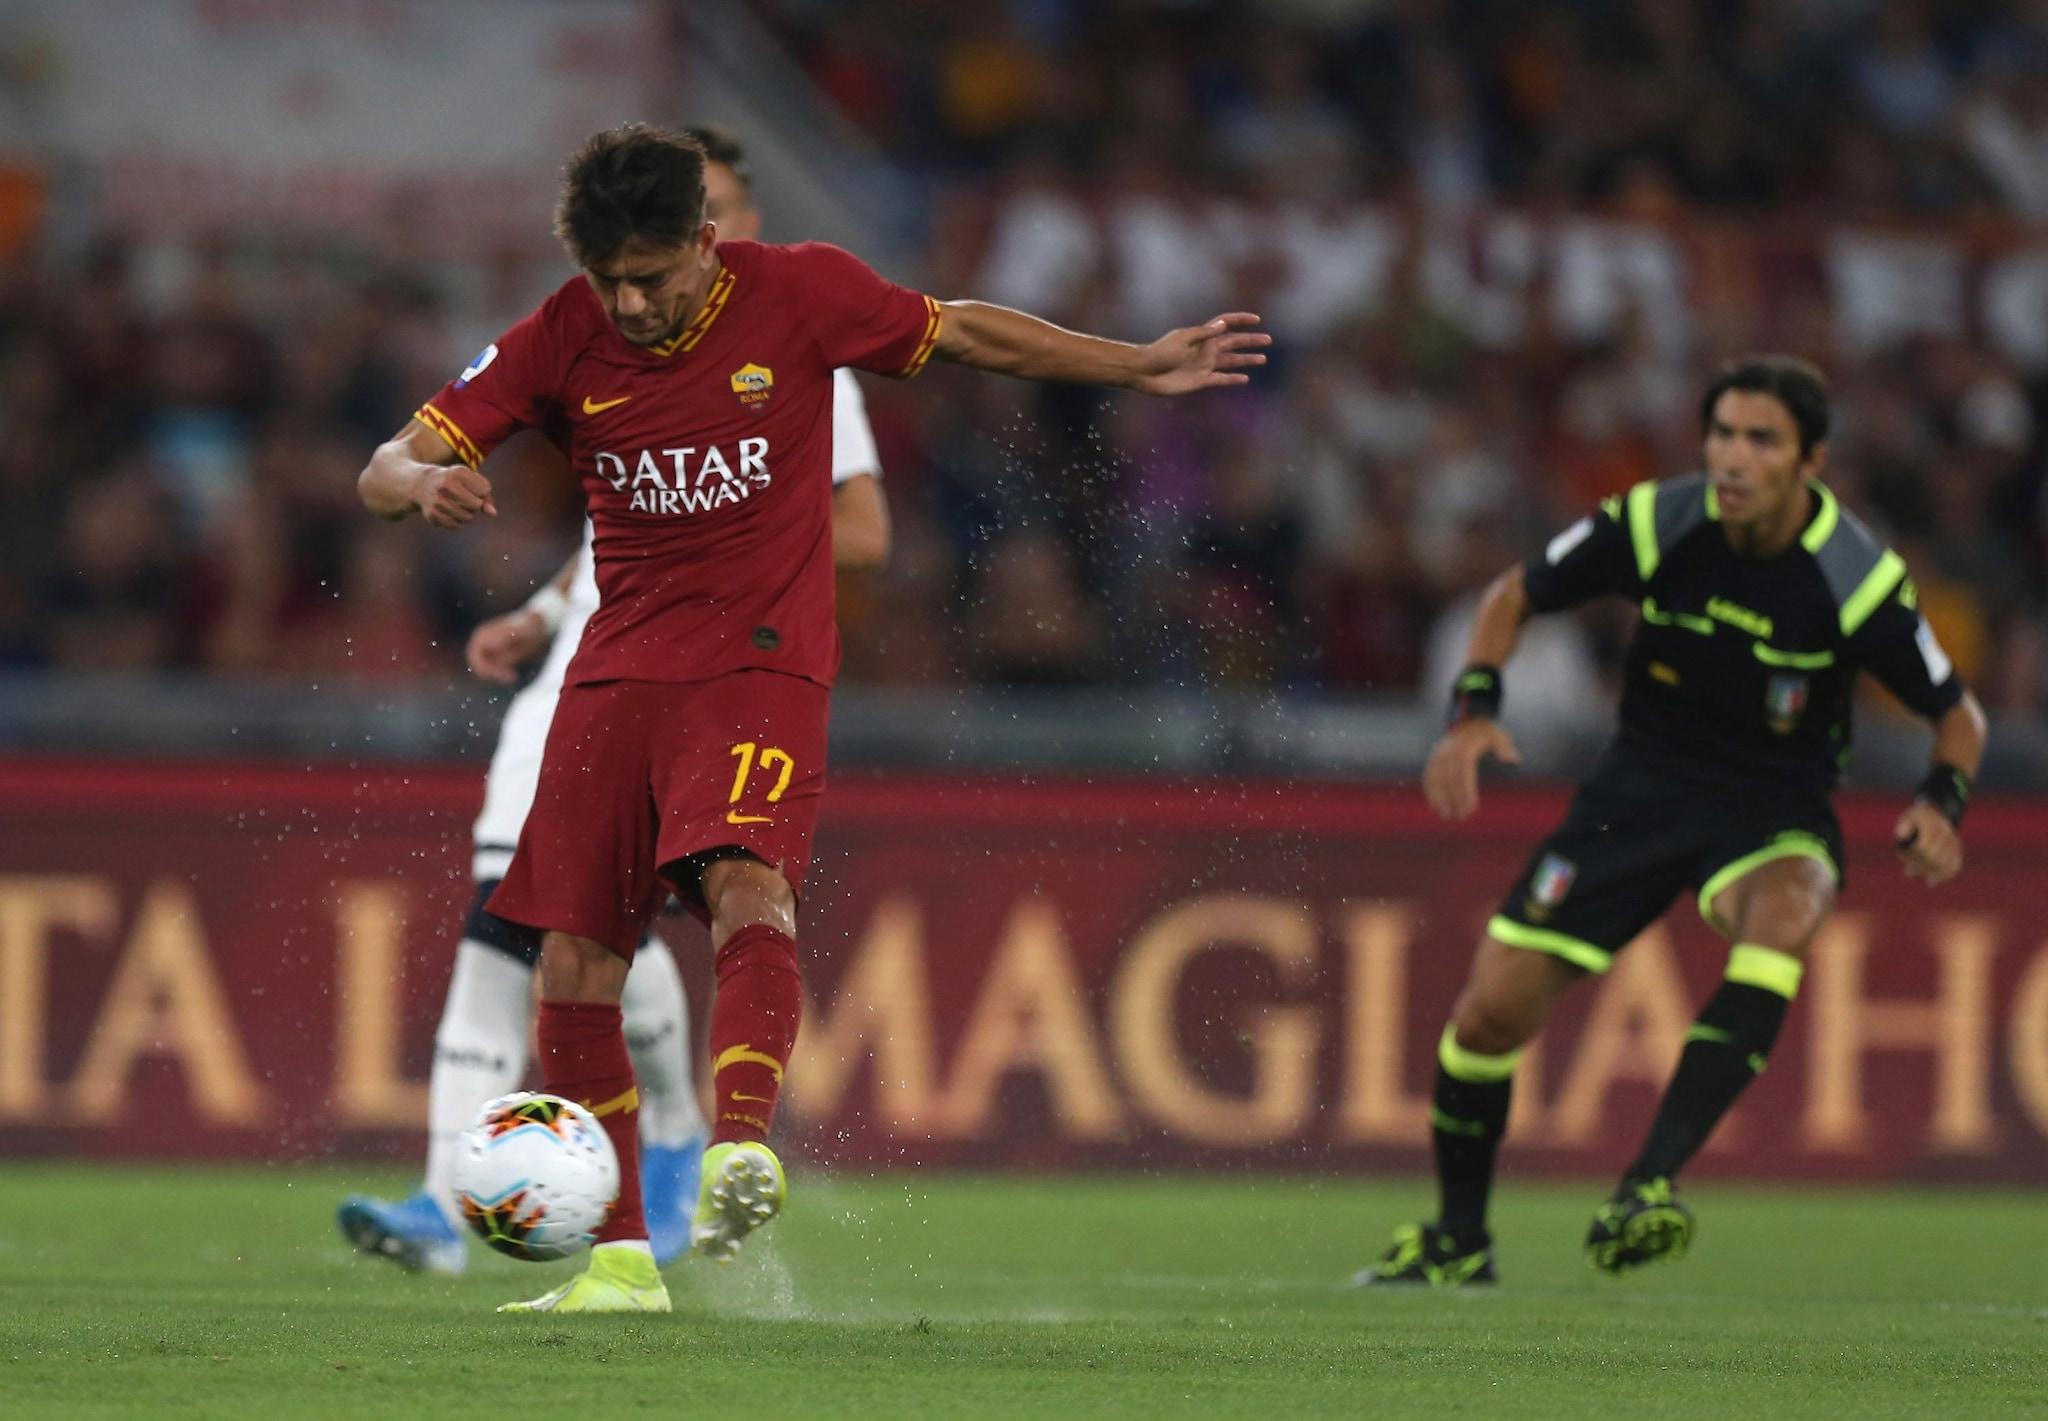 Un gol all'esordio in campionato per Under.